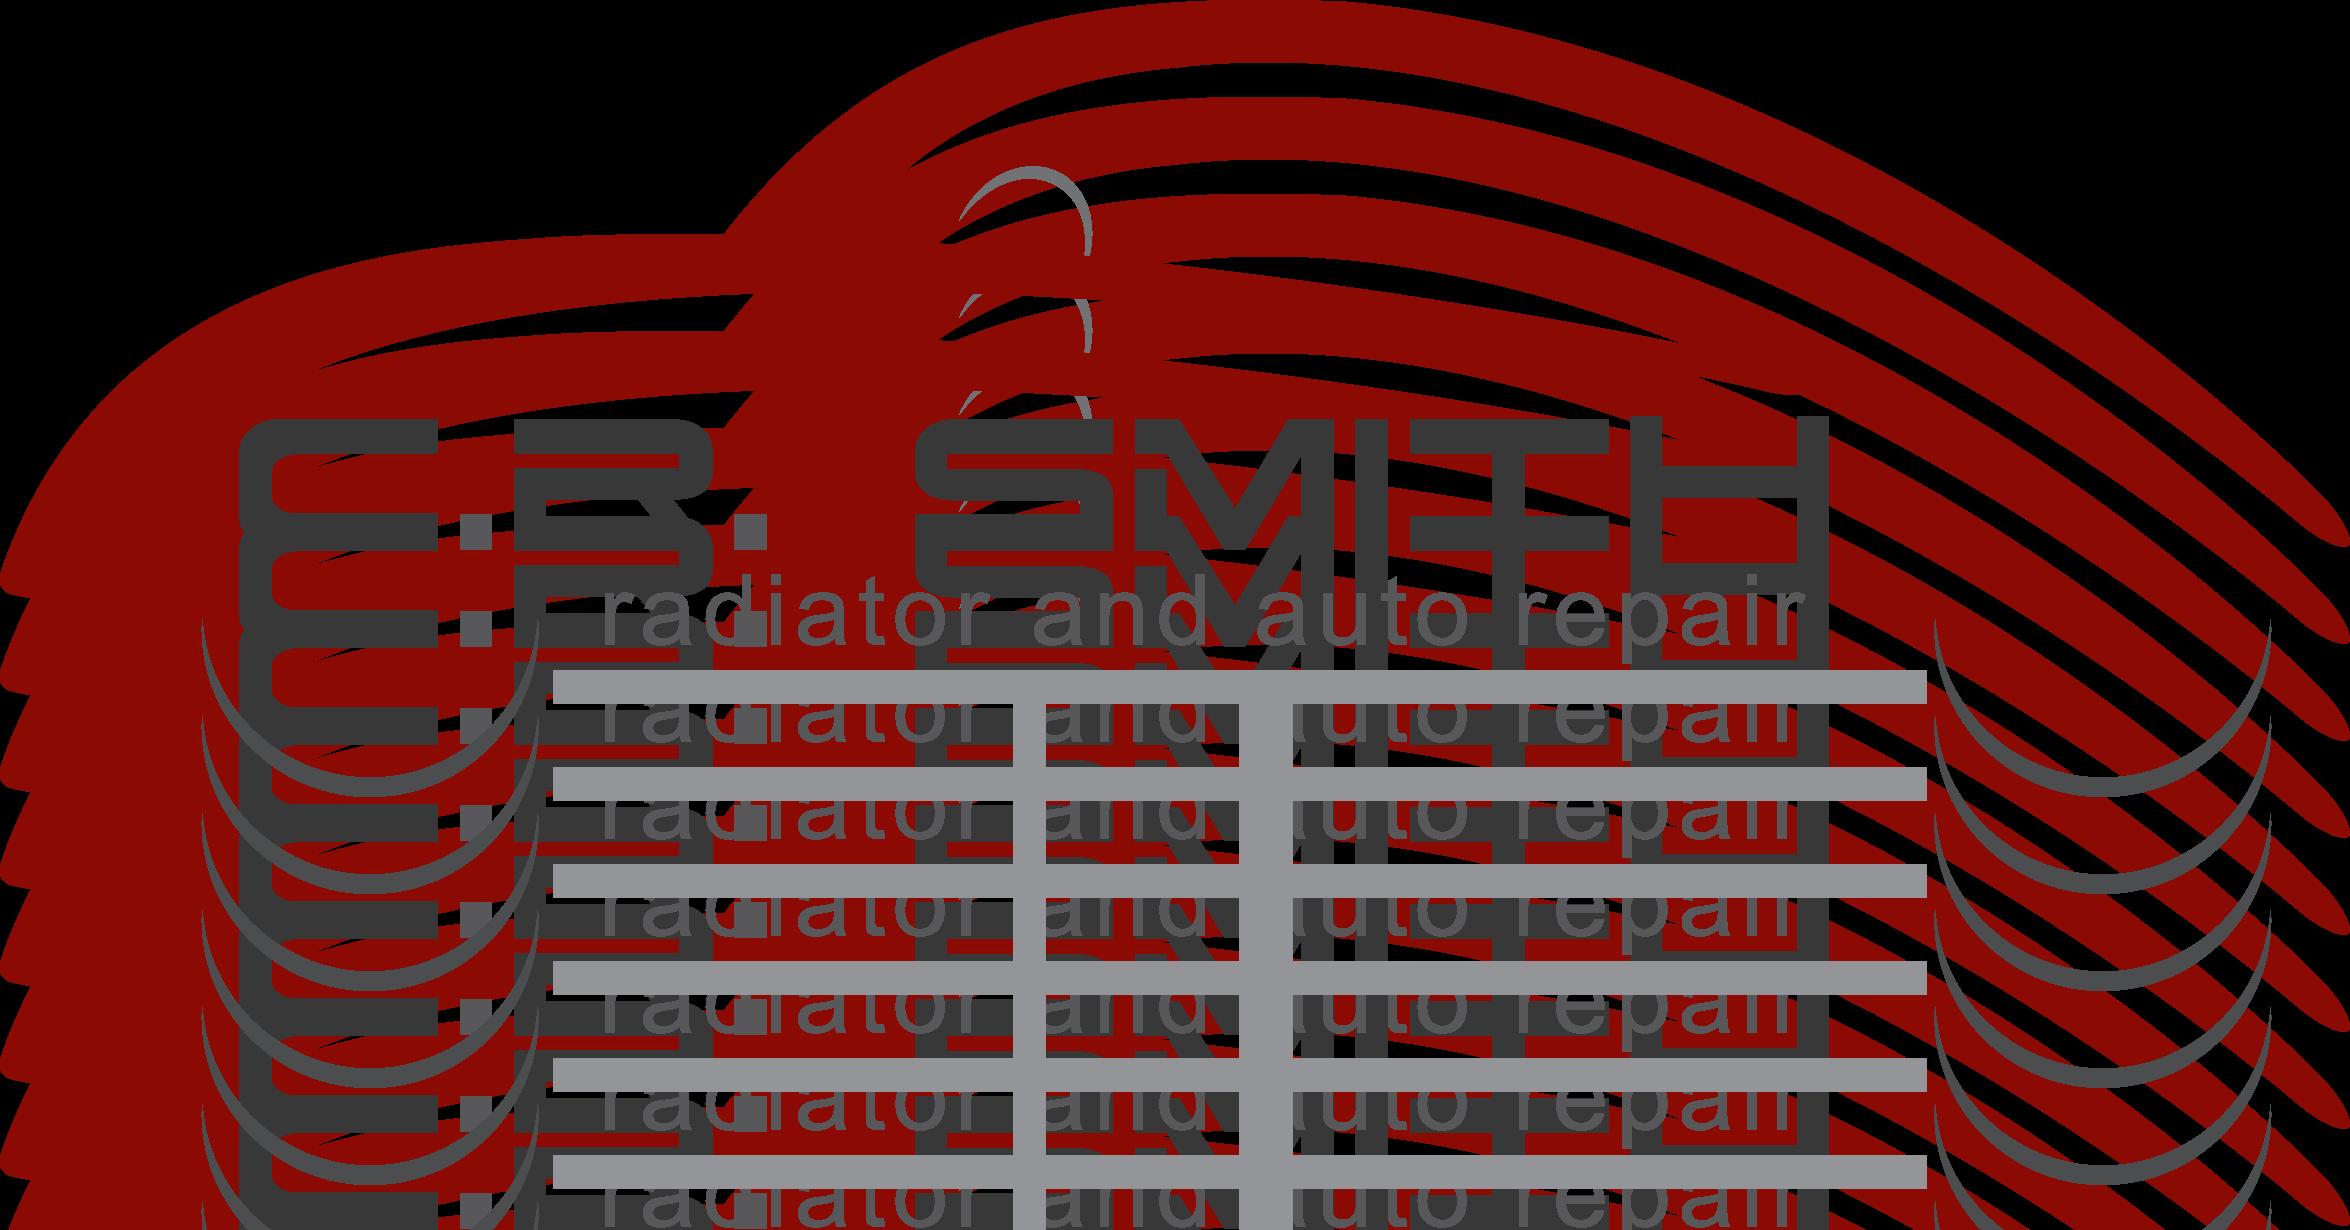 C.R. Smith Radiator and Auto Repair